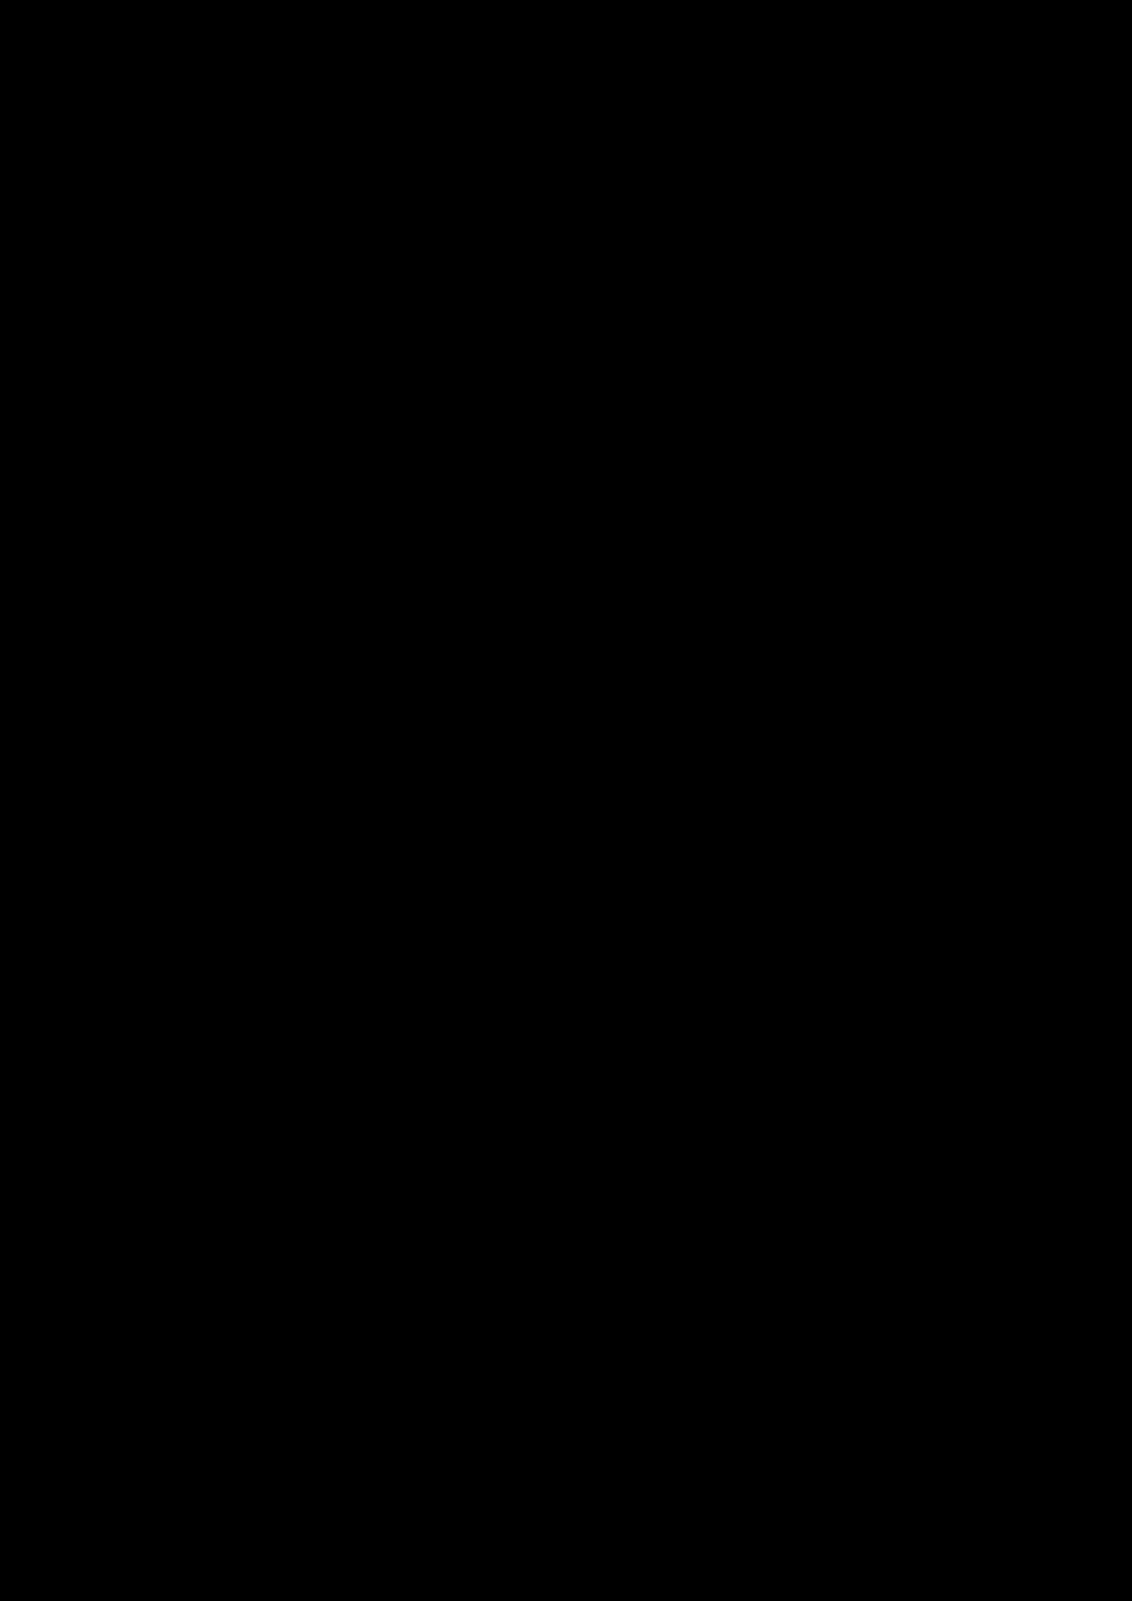 CHujina slide, Image 2